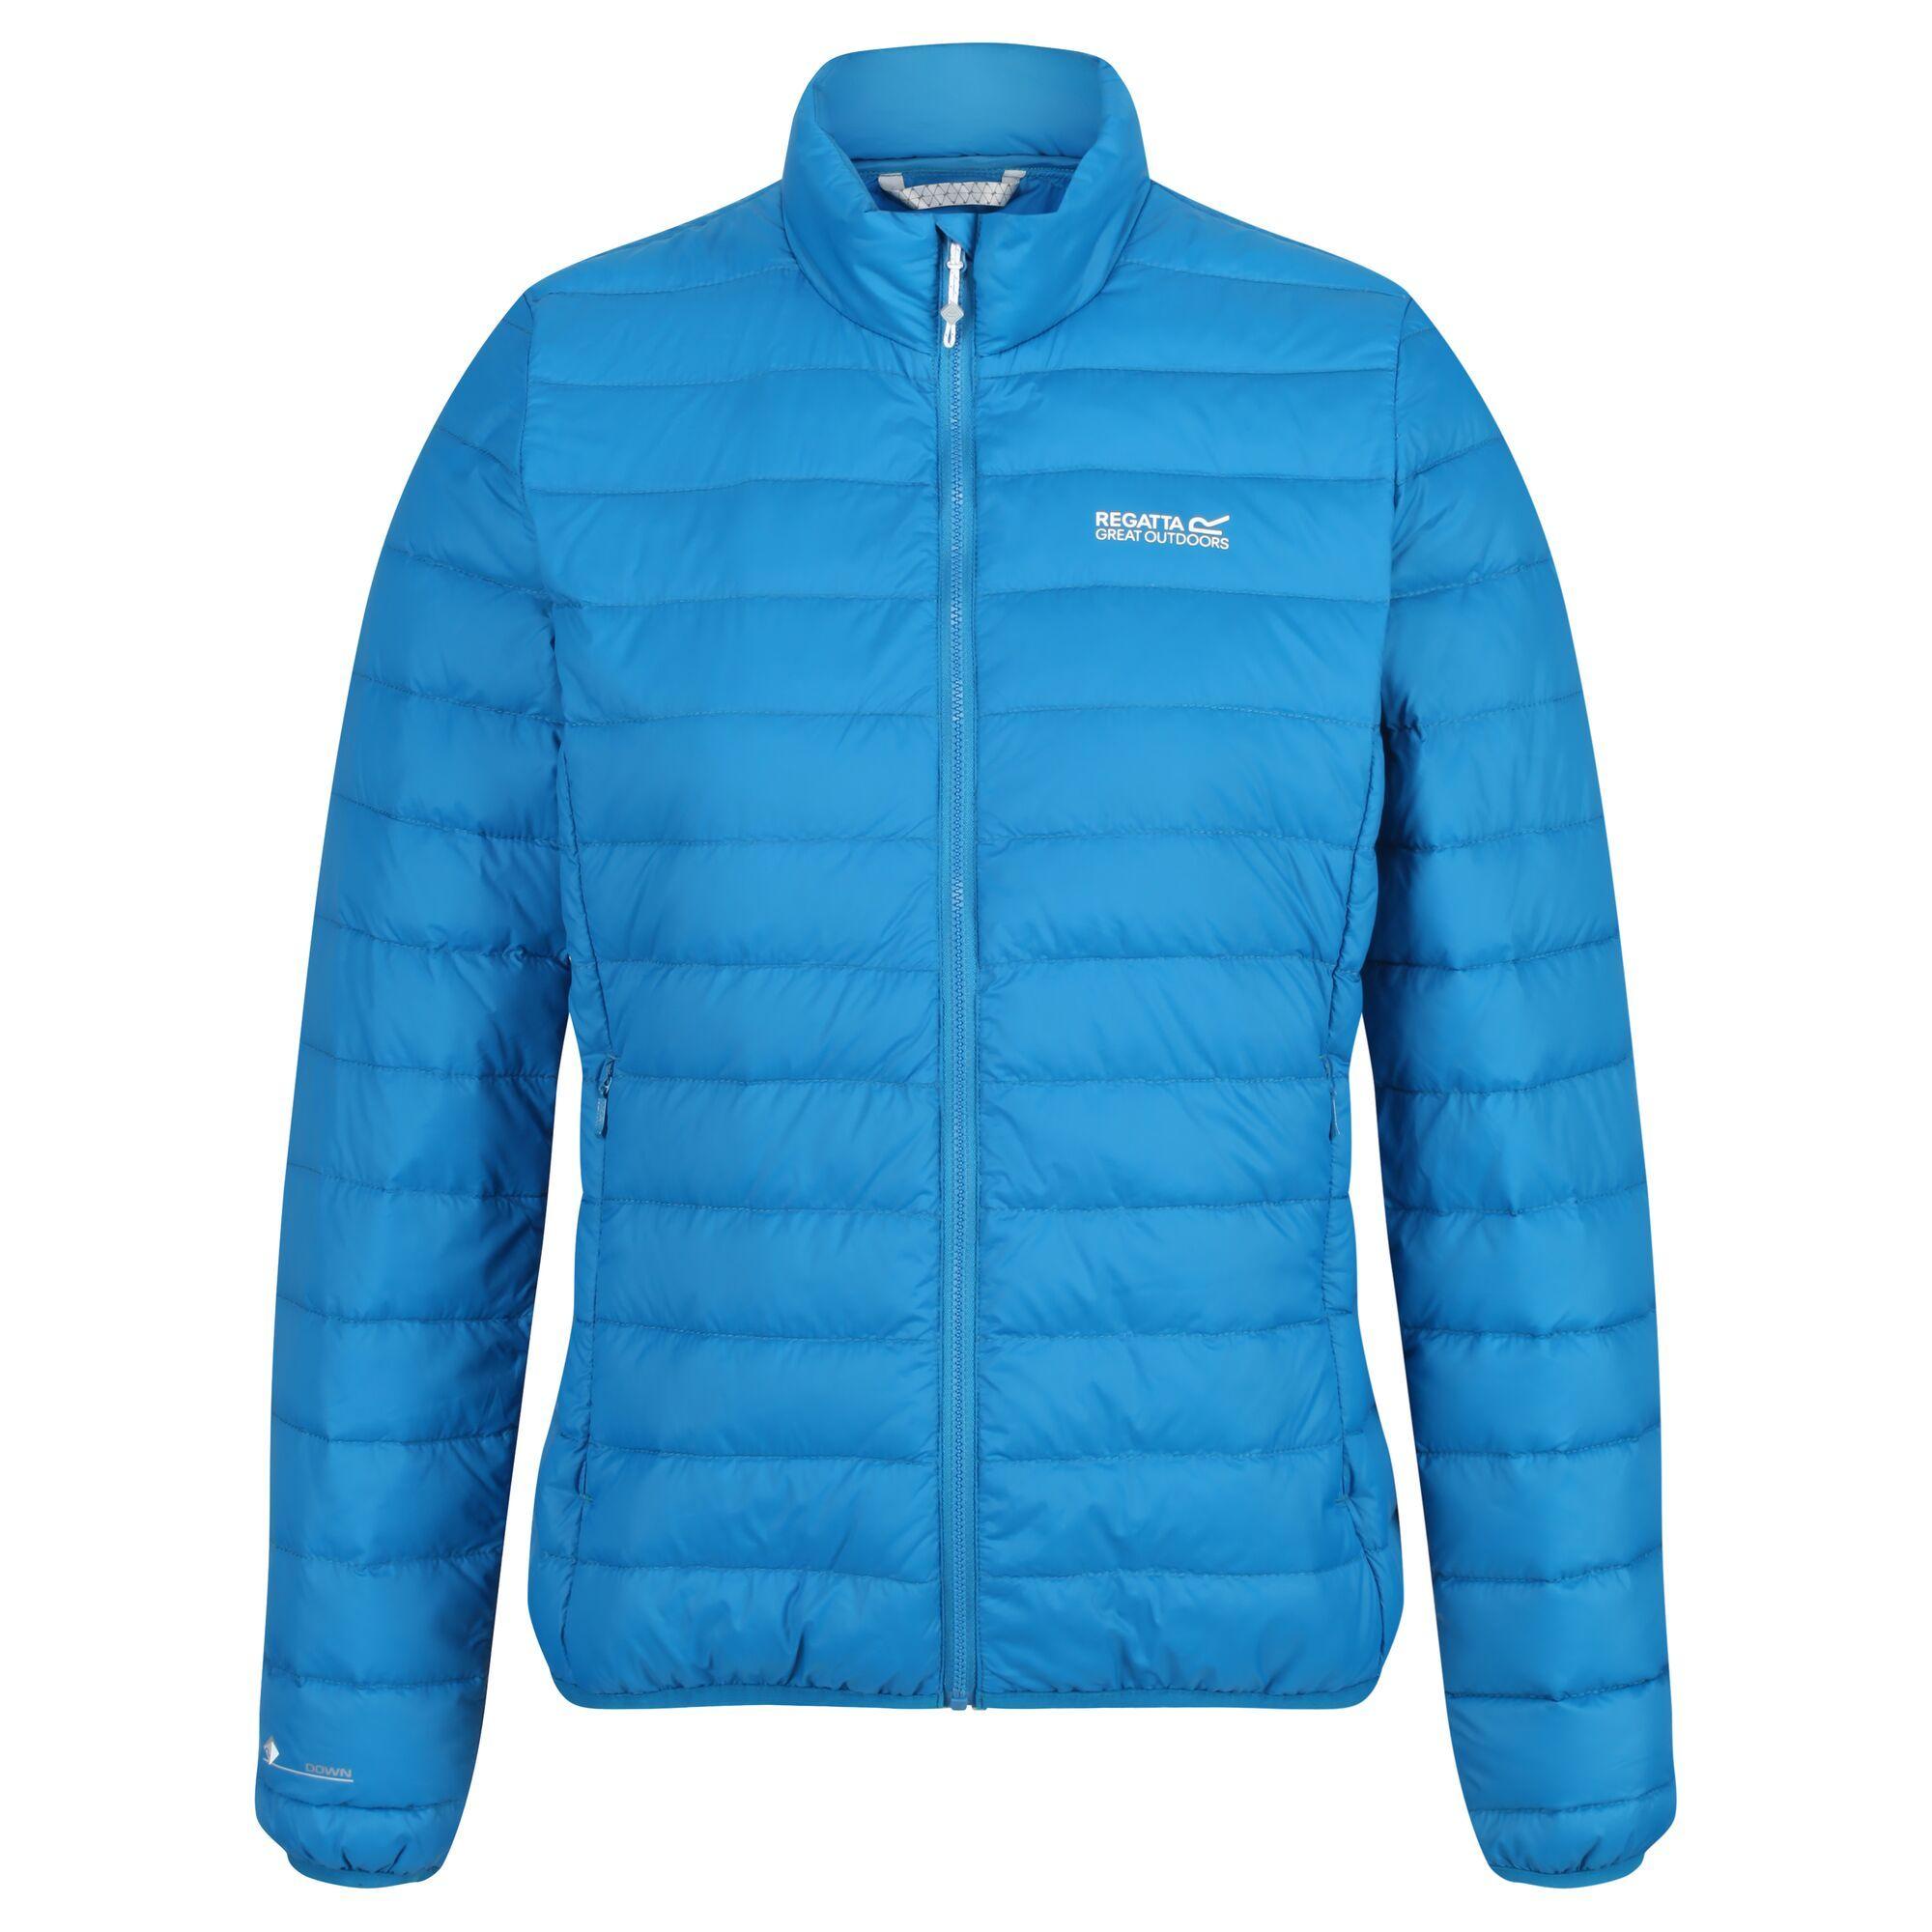 Regatta Womens/Ladies Whitehill Jacket (Petrol Blue)